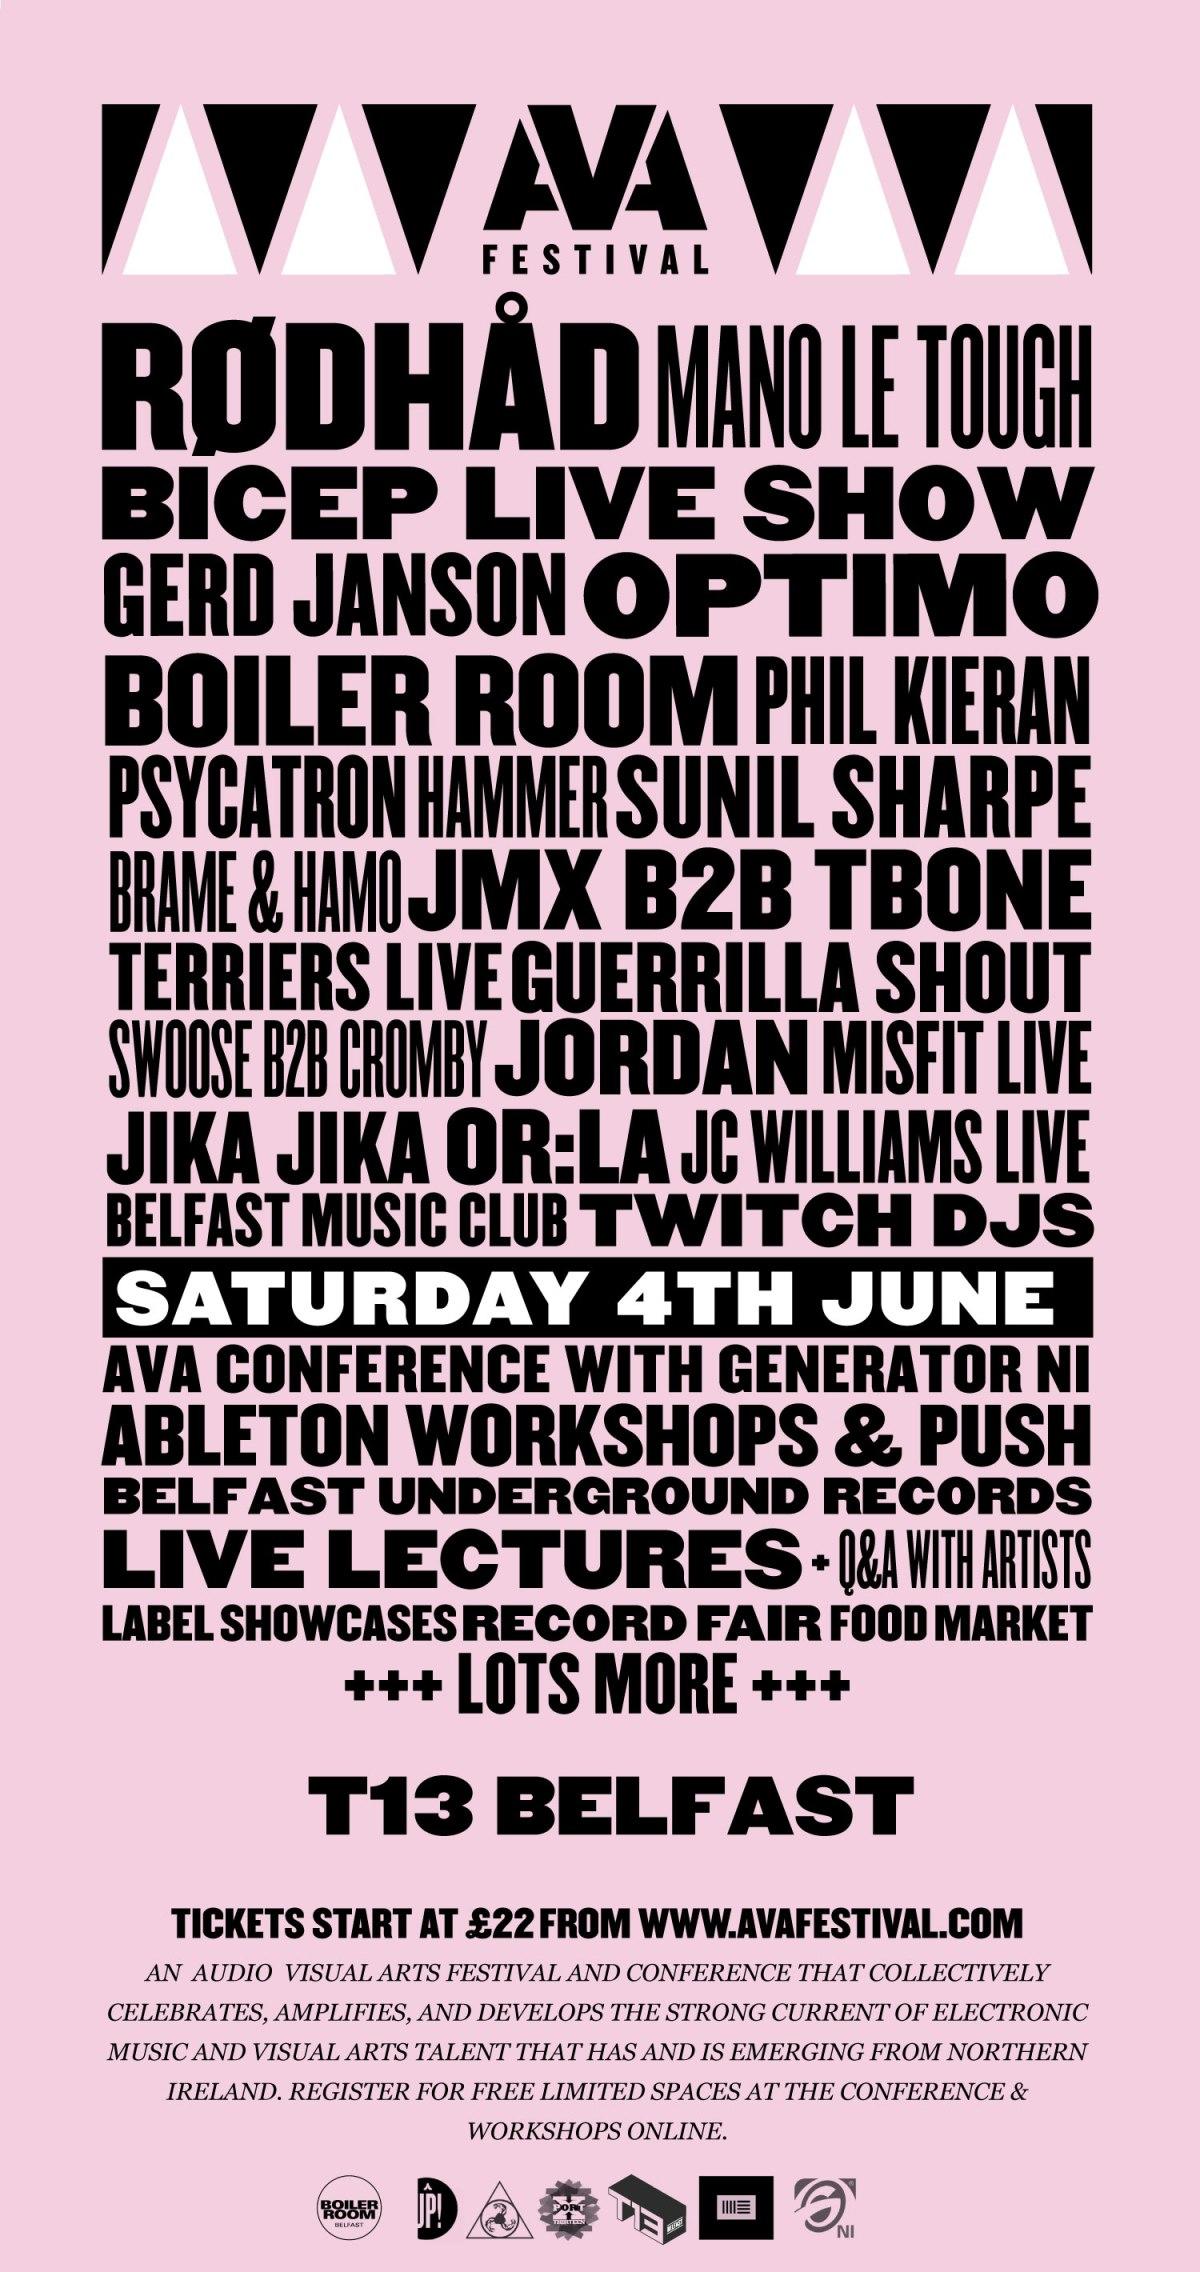 Belfast Ava Festival Announces HugeLineup